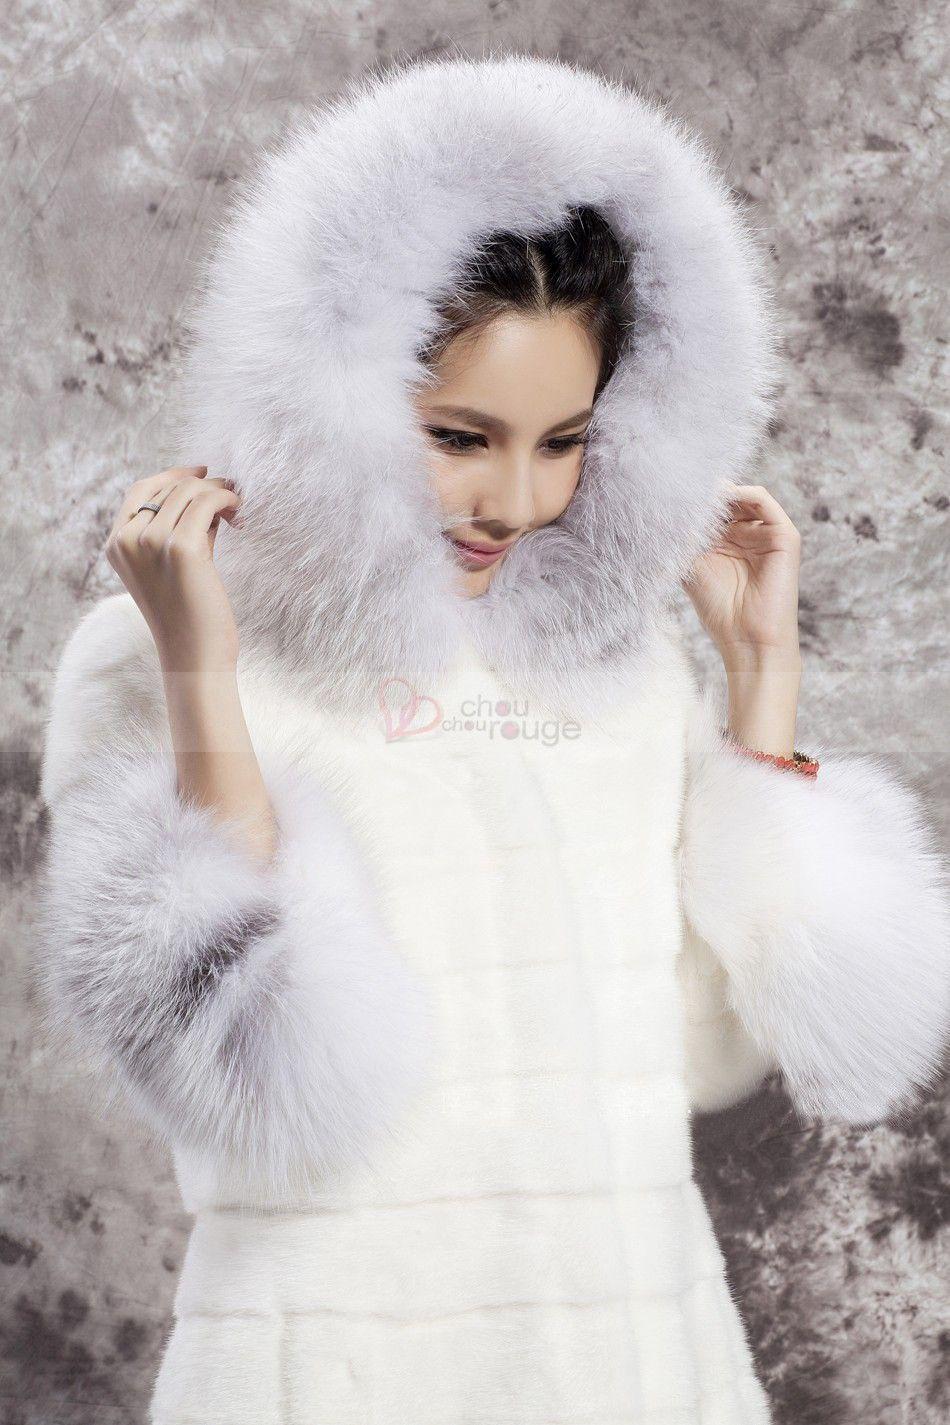 Manteau en daim a capuche